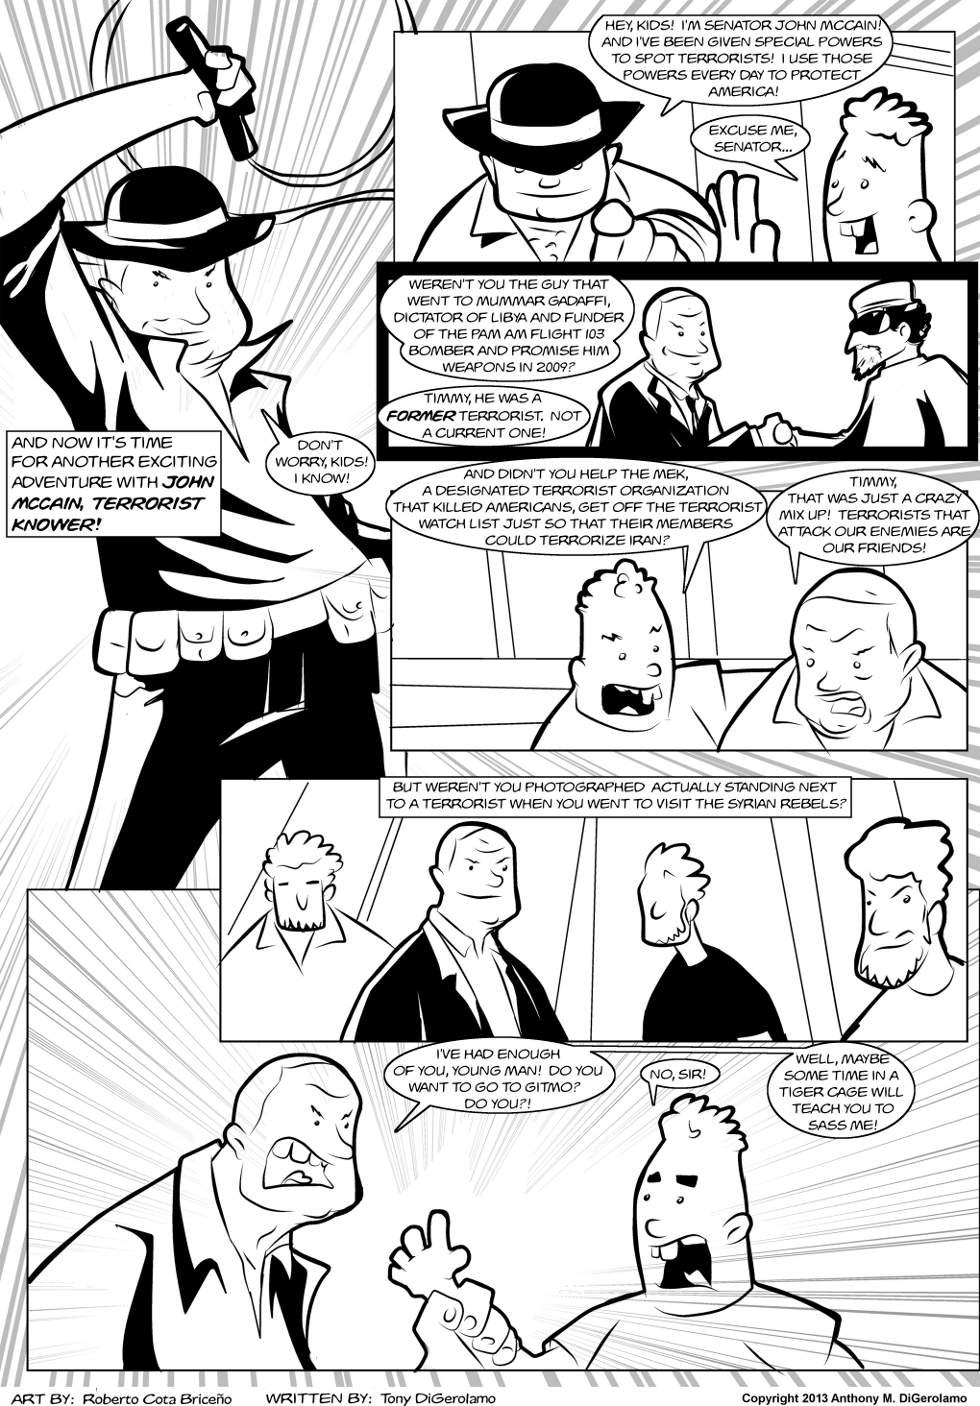 The Antiwar Comic:  John McCain, Terrorist Knower!